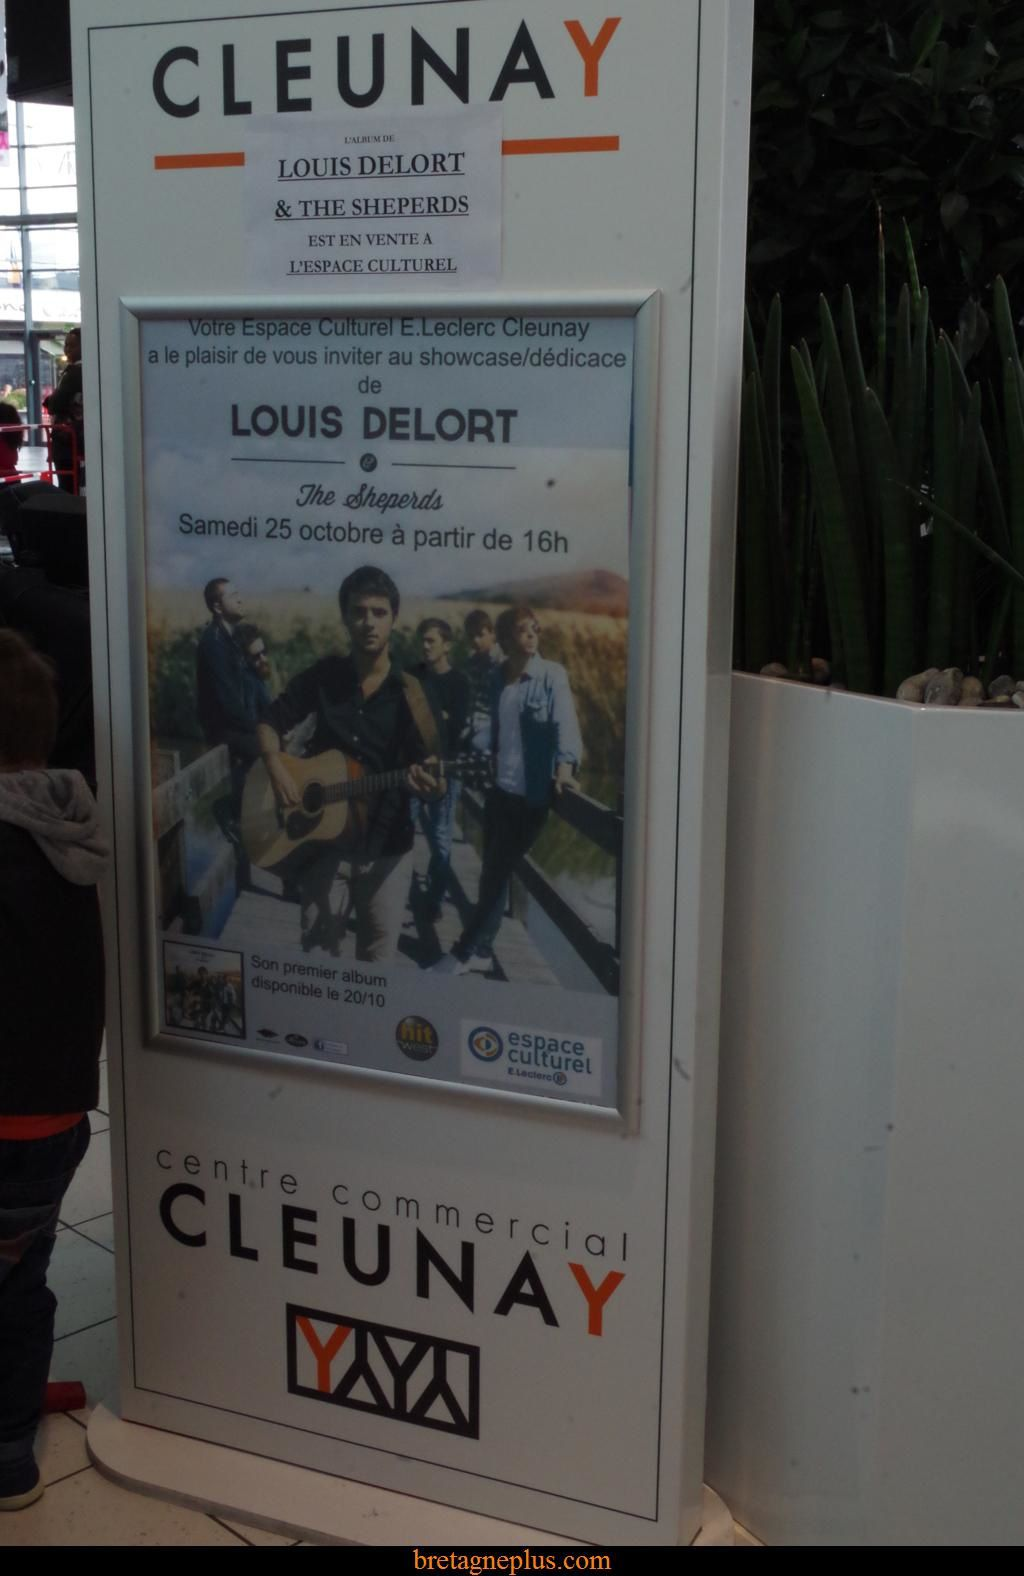 Louis Delort en showcase au Leclerc Cleunay